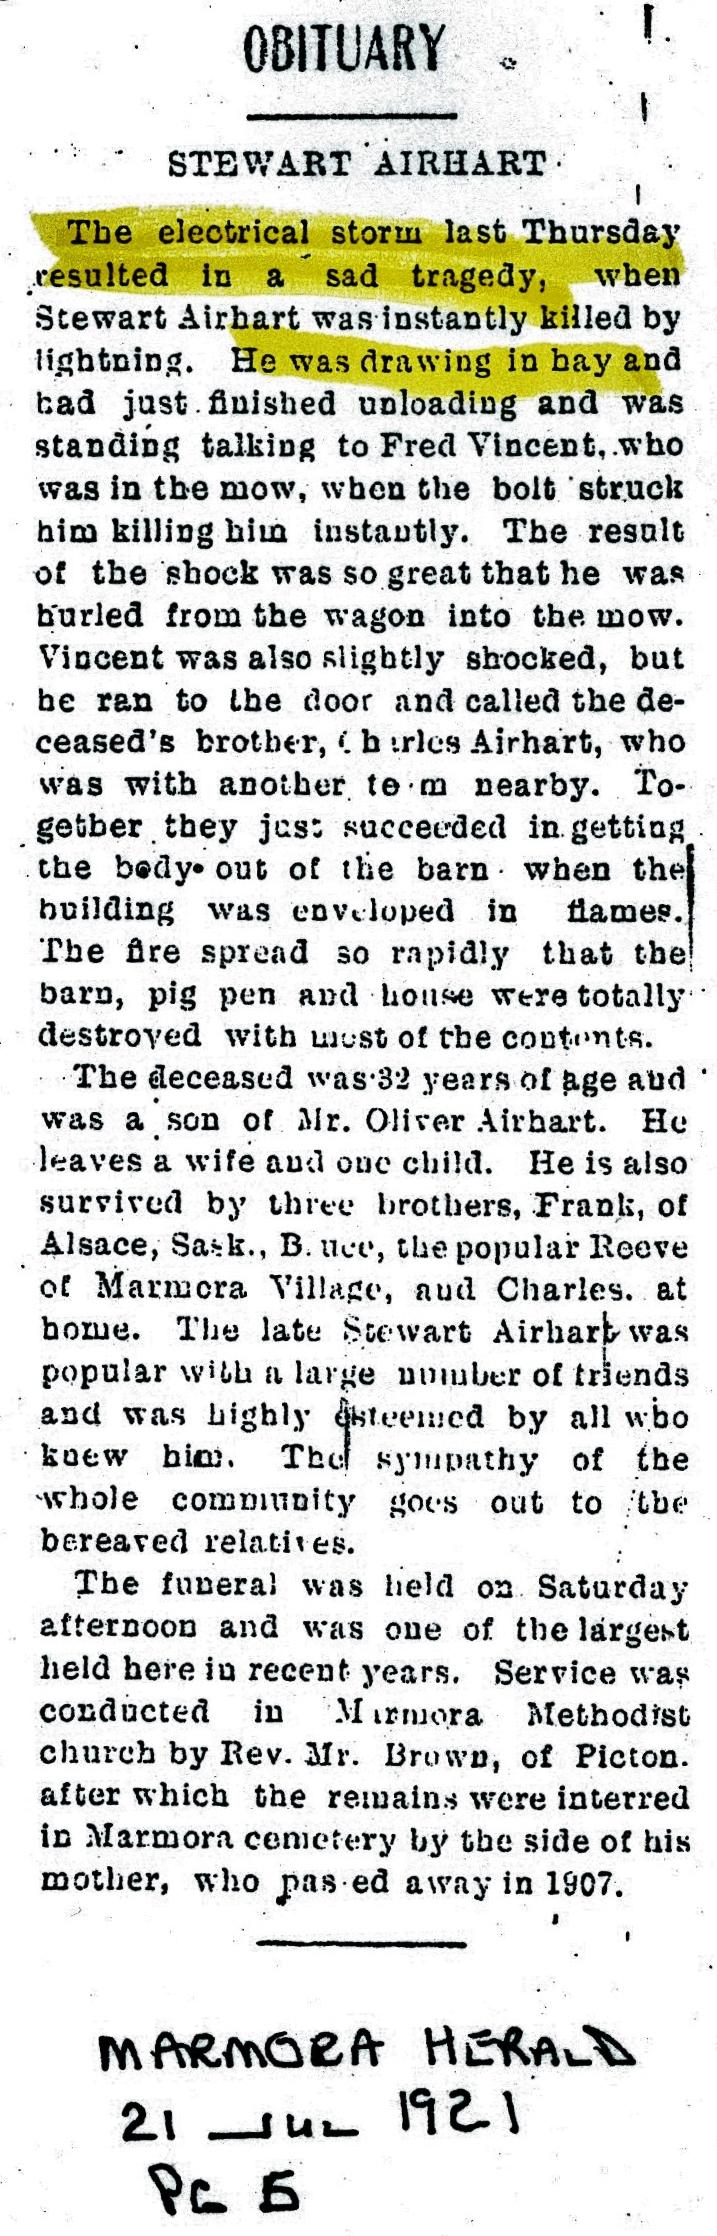 Airhart, Stewart, farmer, 1889-1921, Bad luck,  lightening strike XXX.jpg